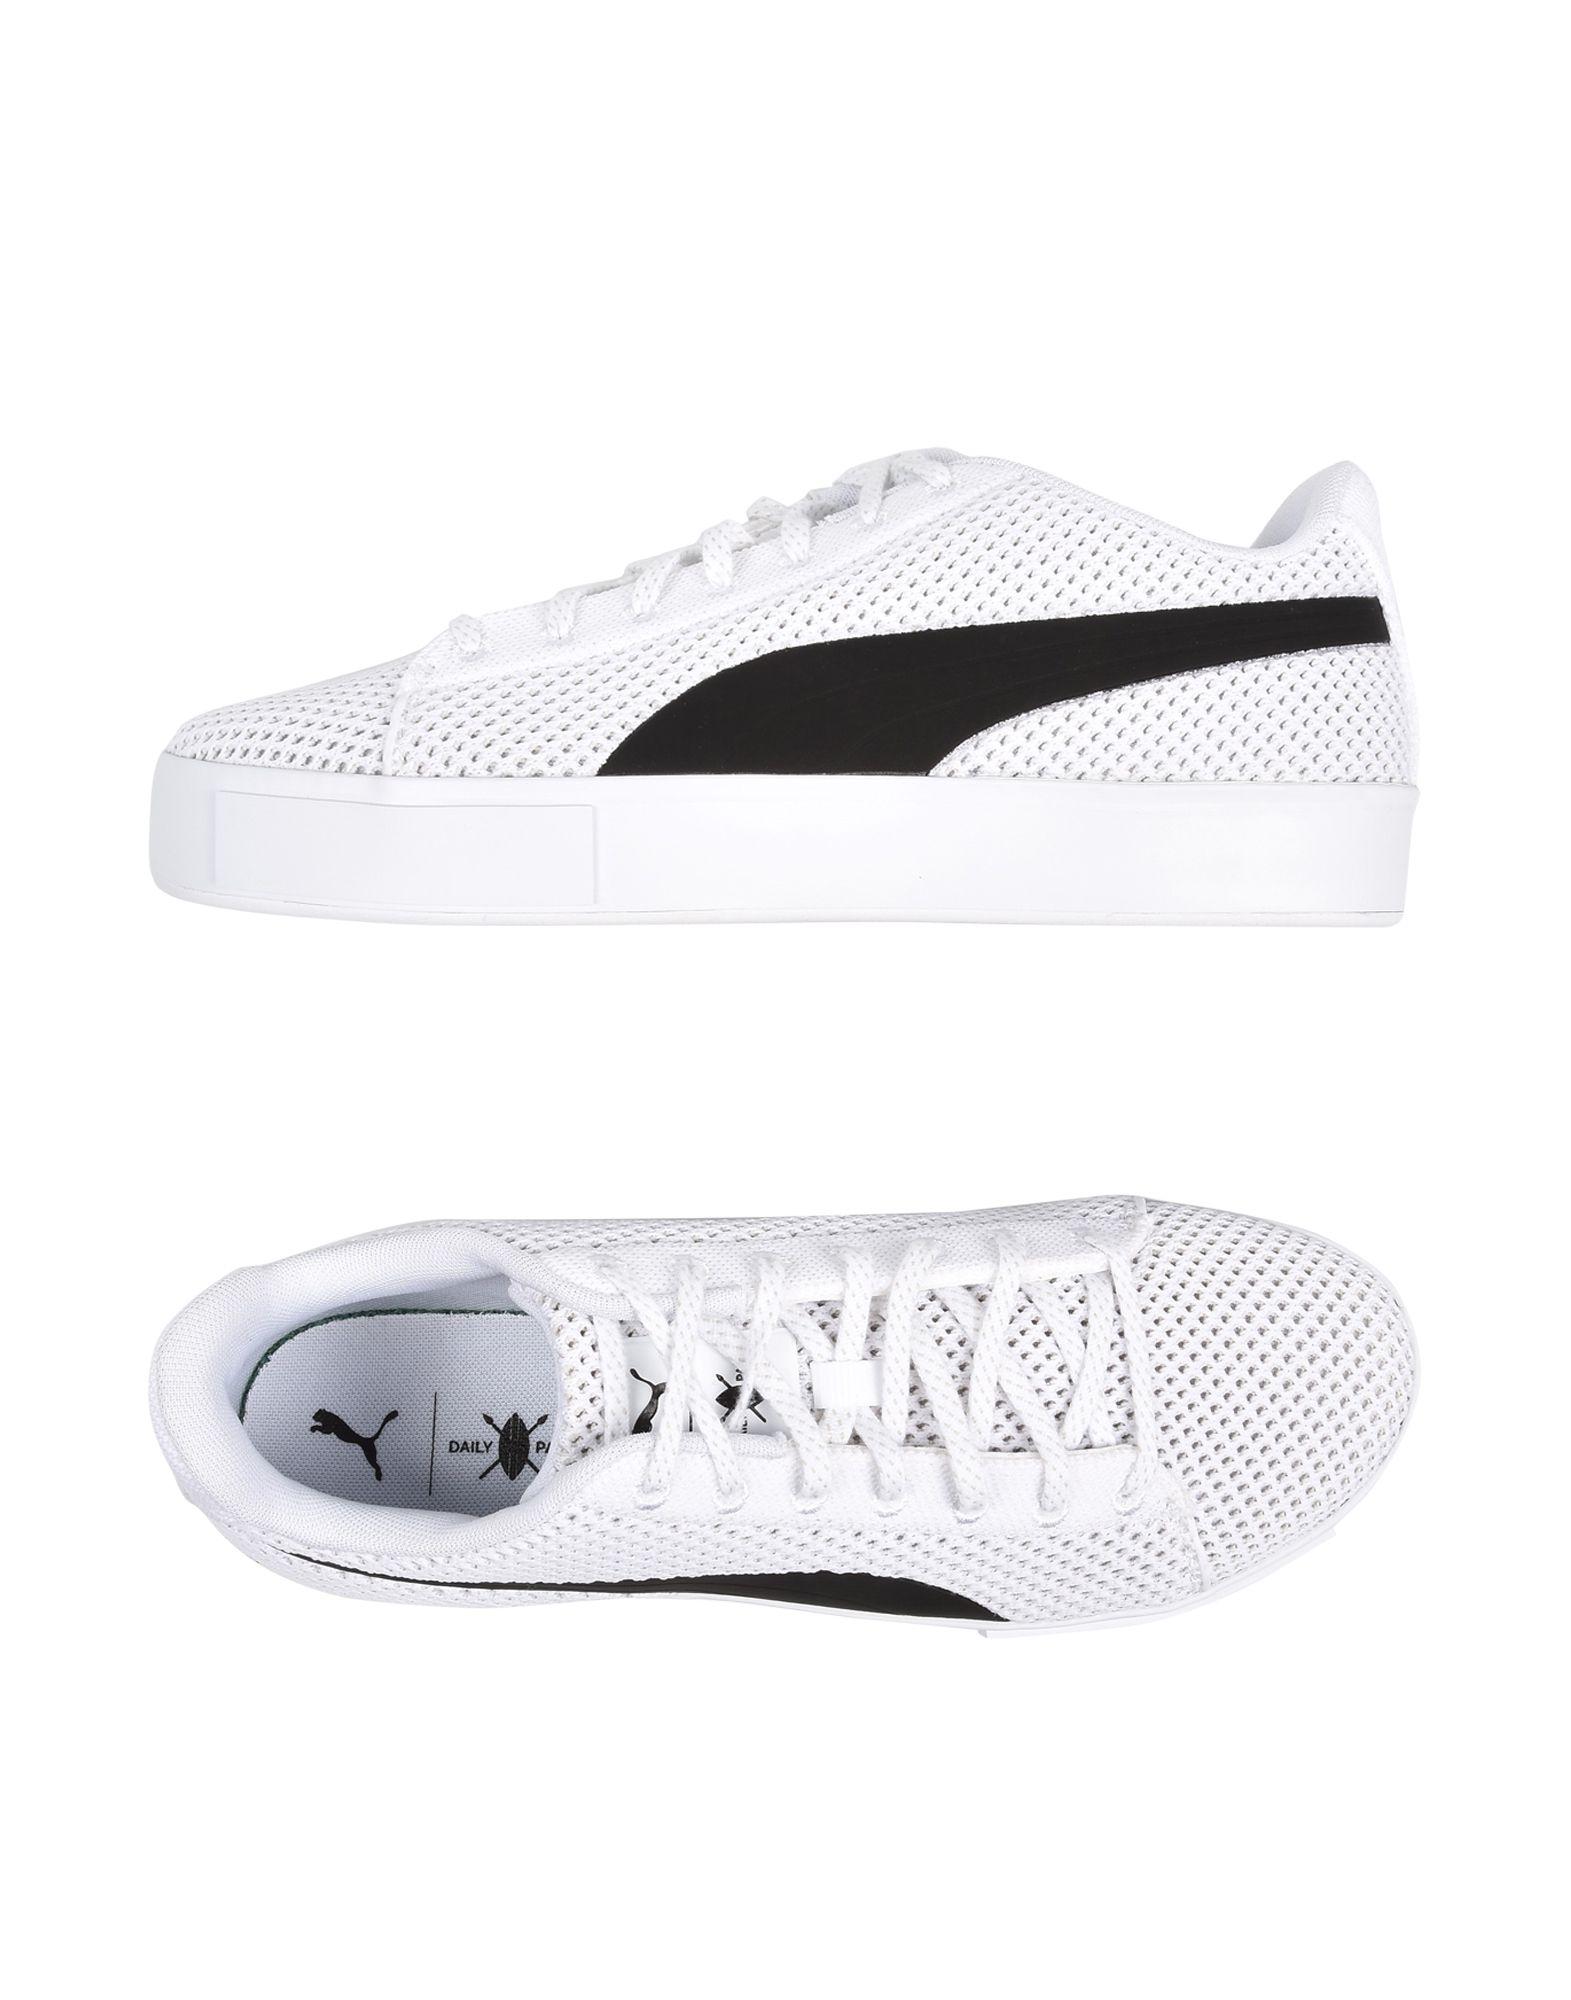 Sneakers Puma X Daily Paper Puma X Dp Court Platform K - Uomo - 11217748BJ